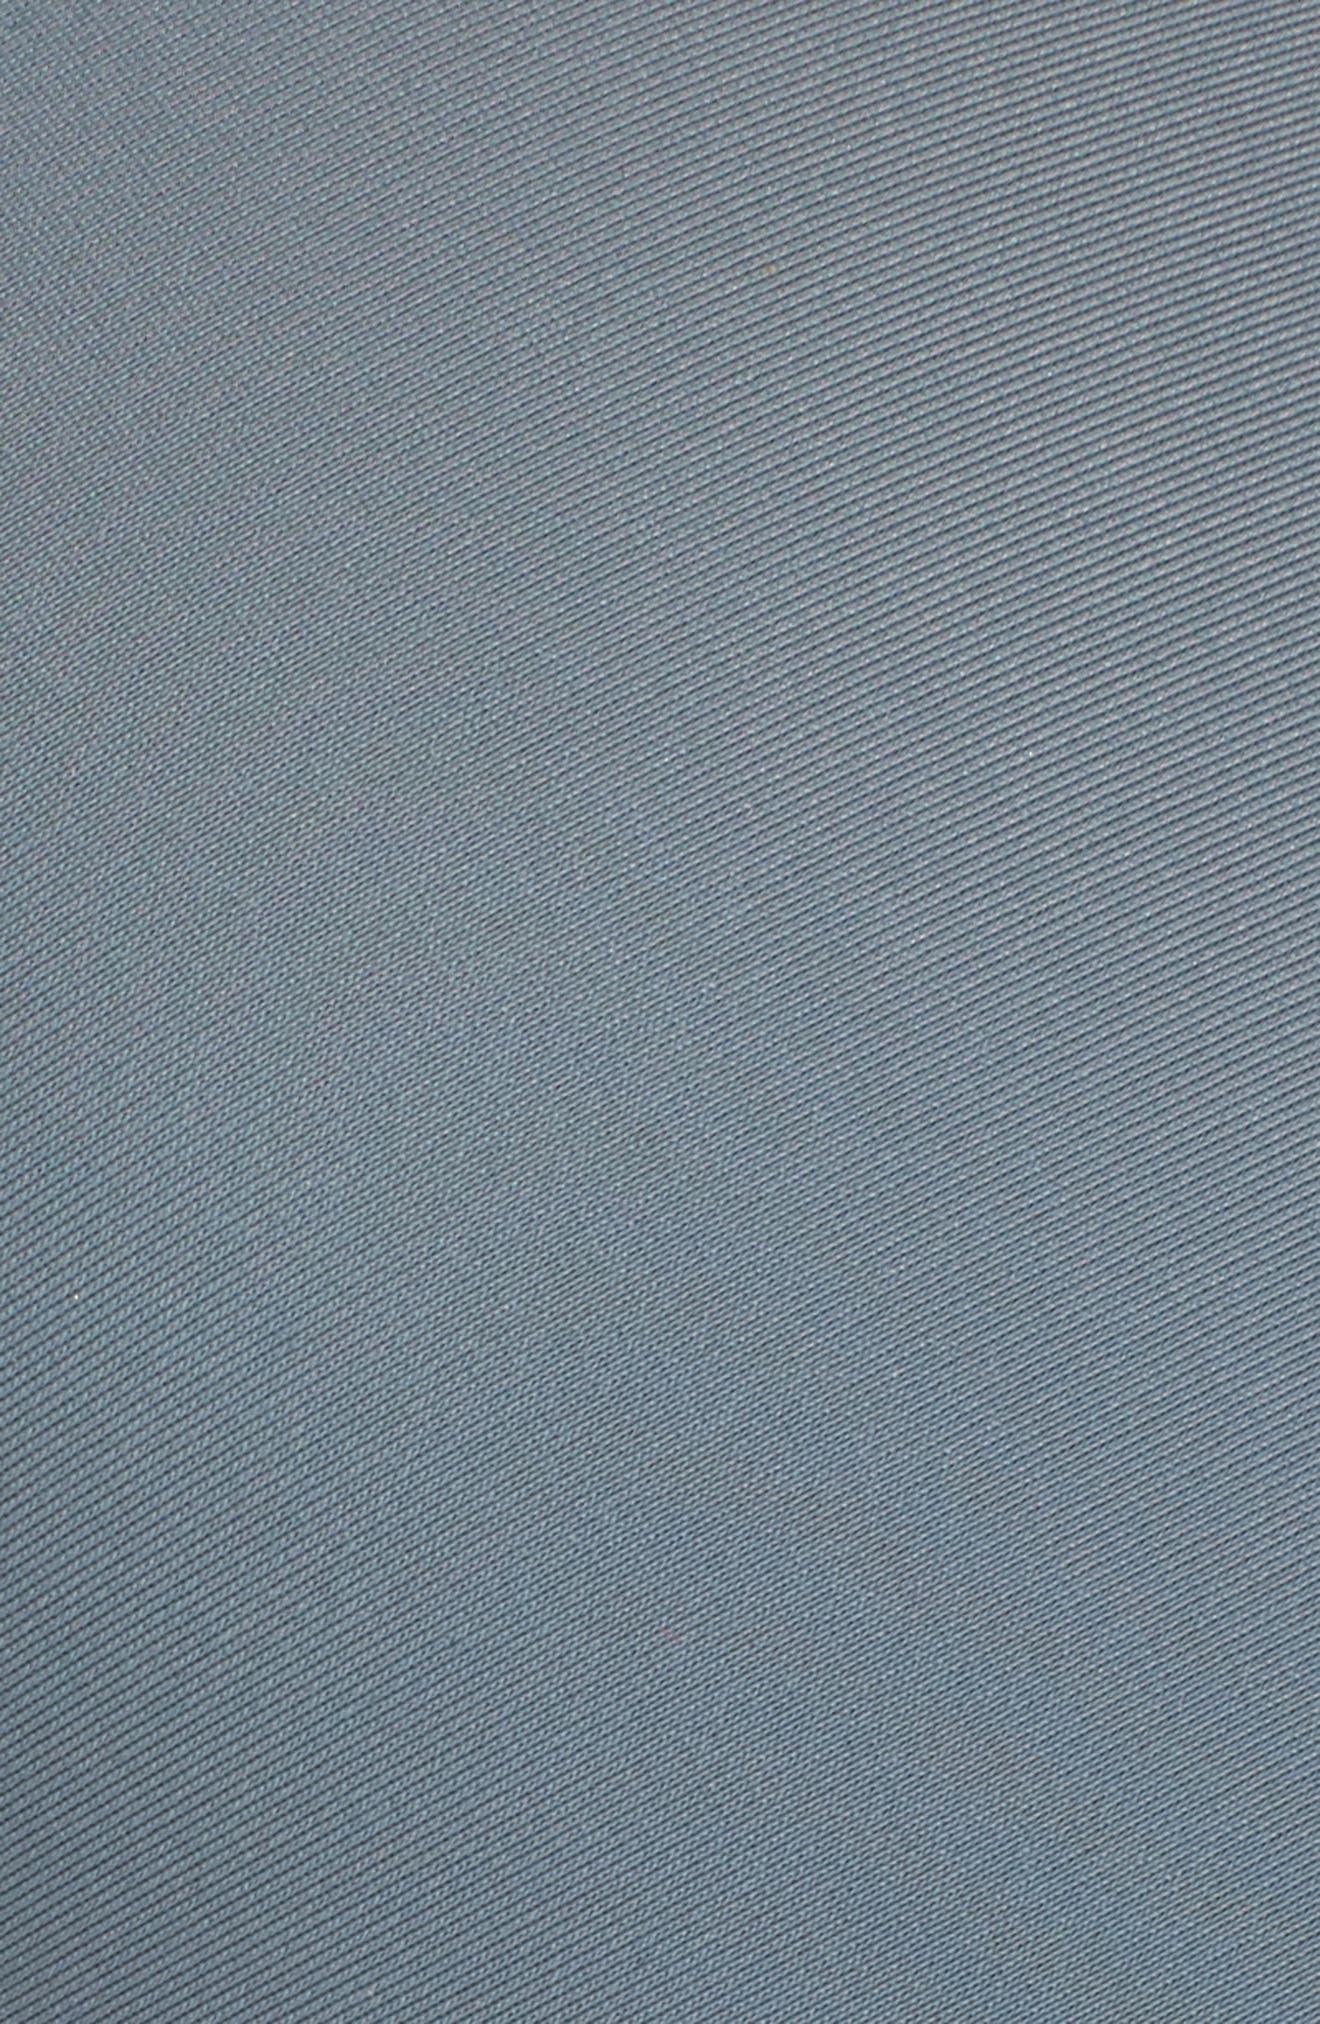 Crossback Bikini Top,                             Alternate thumbnail 5, color,                             Grey Excalibur